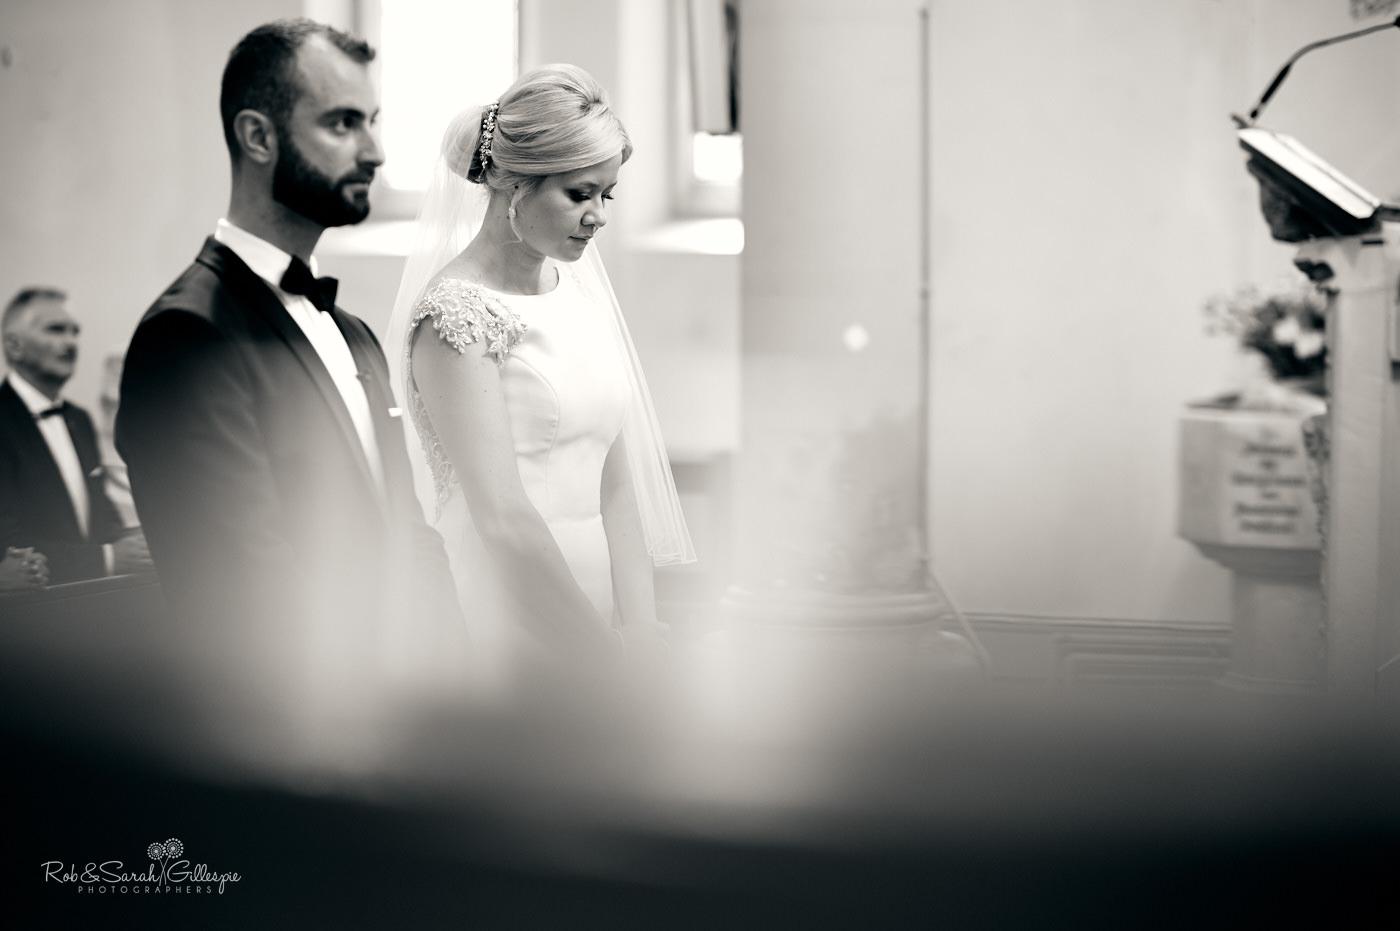 Wedding ceremony at St Anne's Roman Catholic church in Birmingham